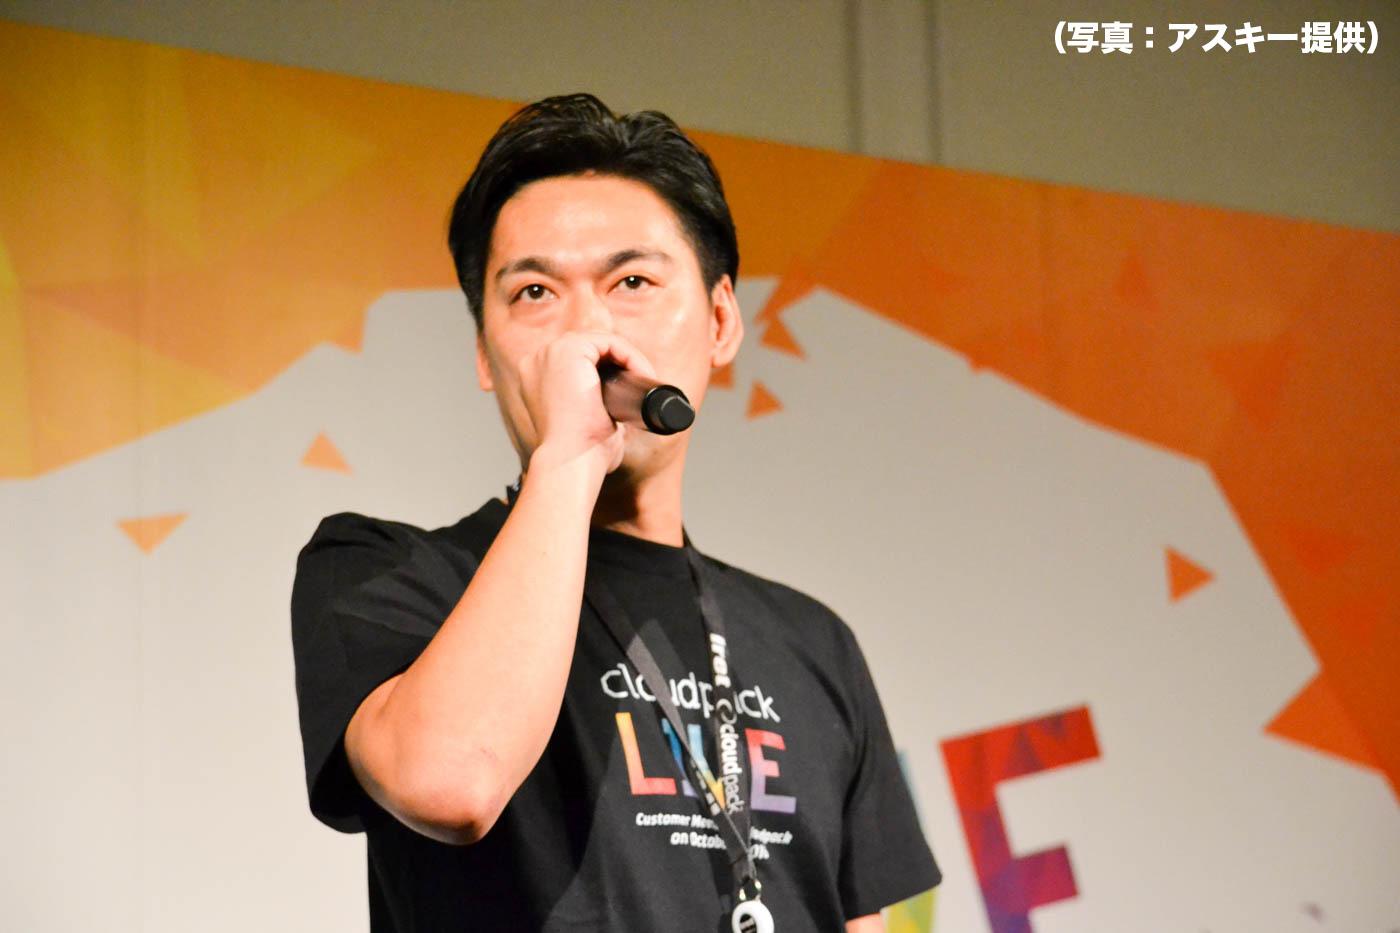 clp-live2016-01